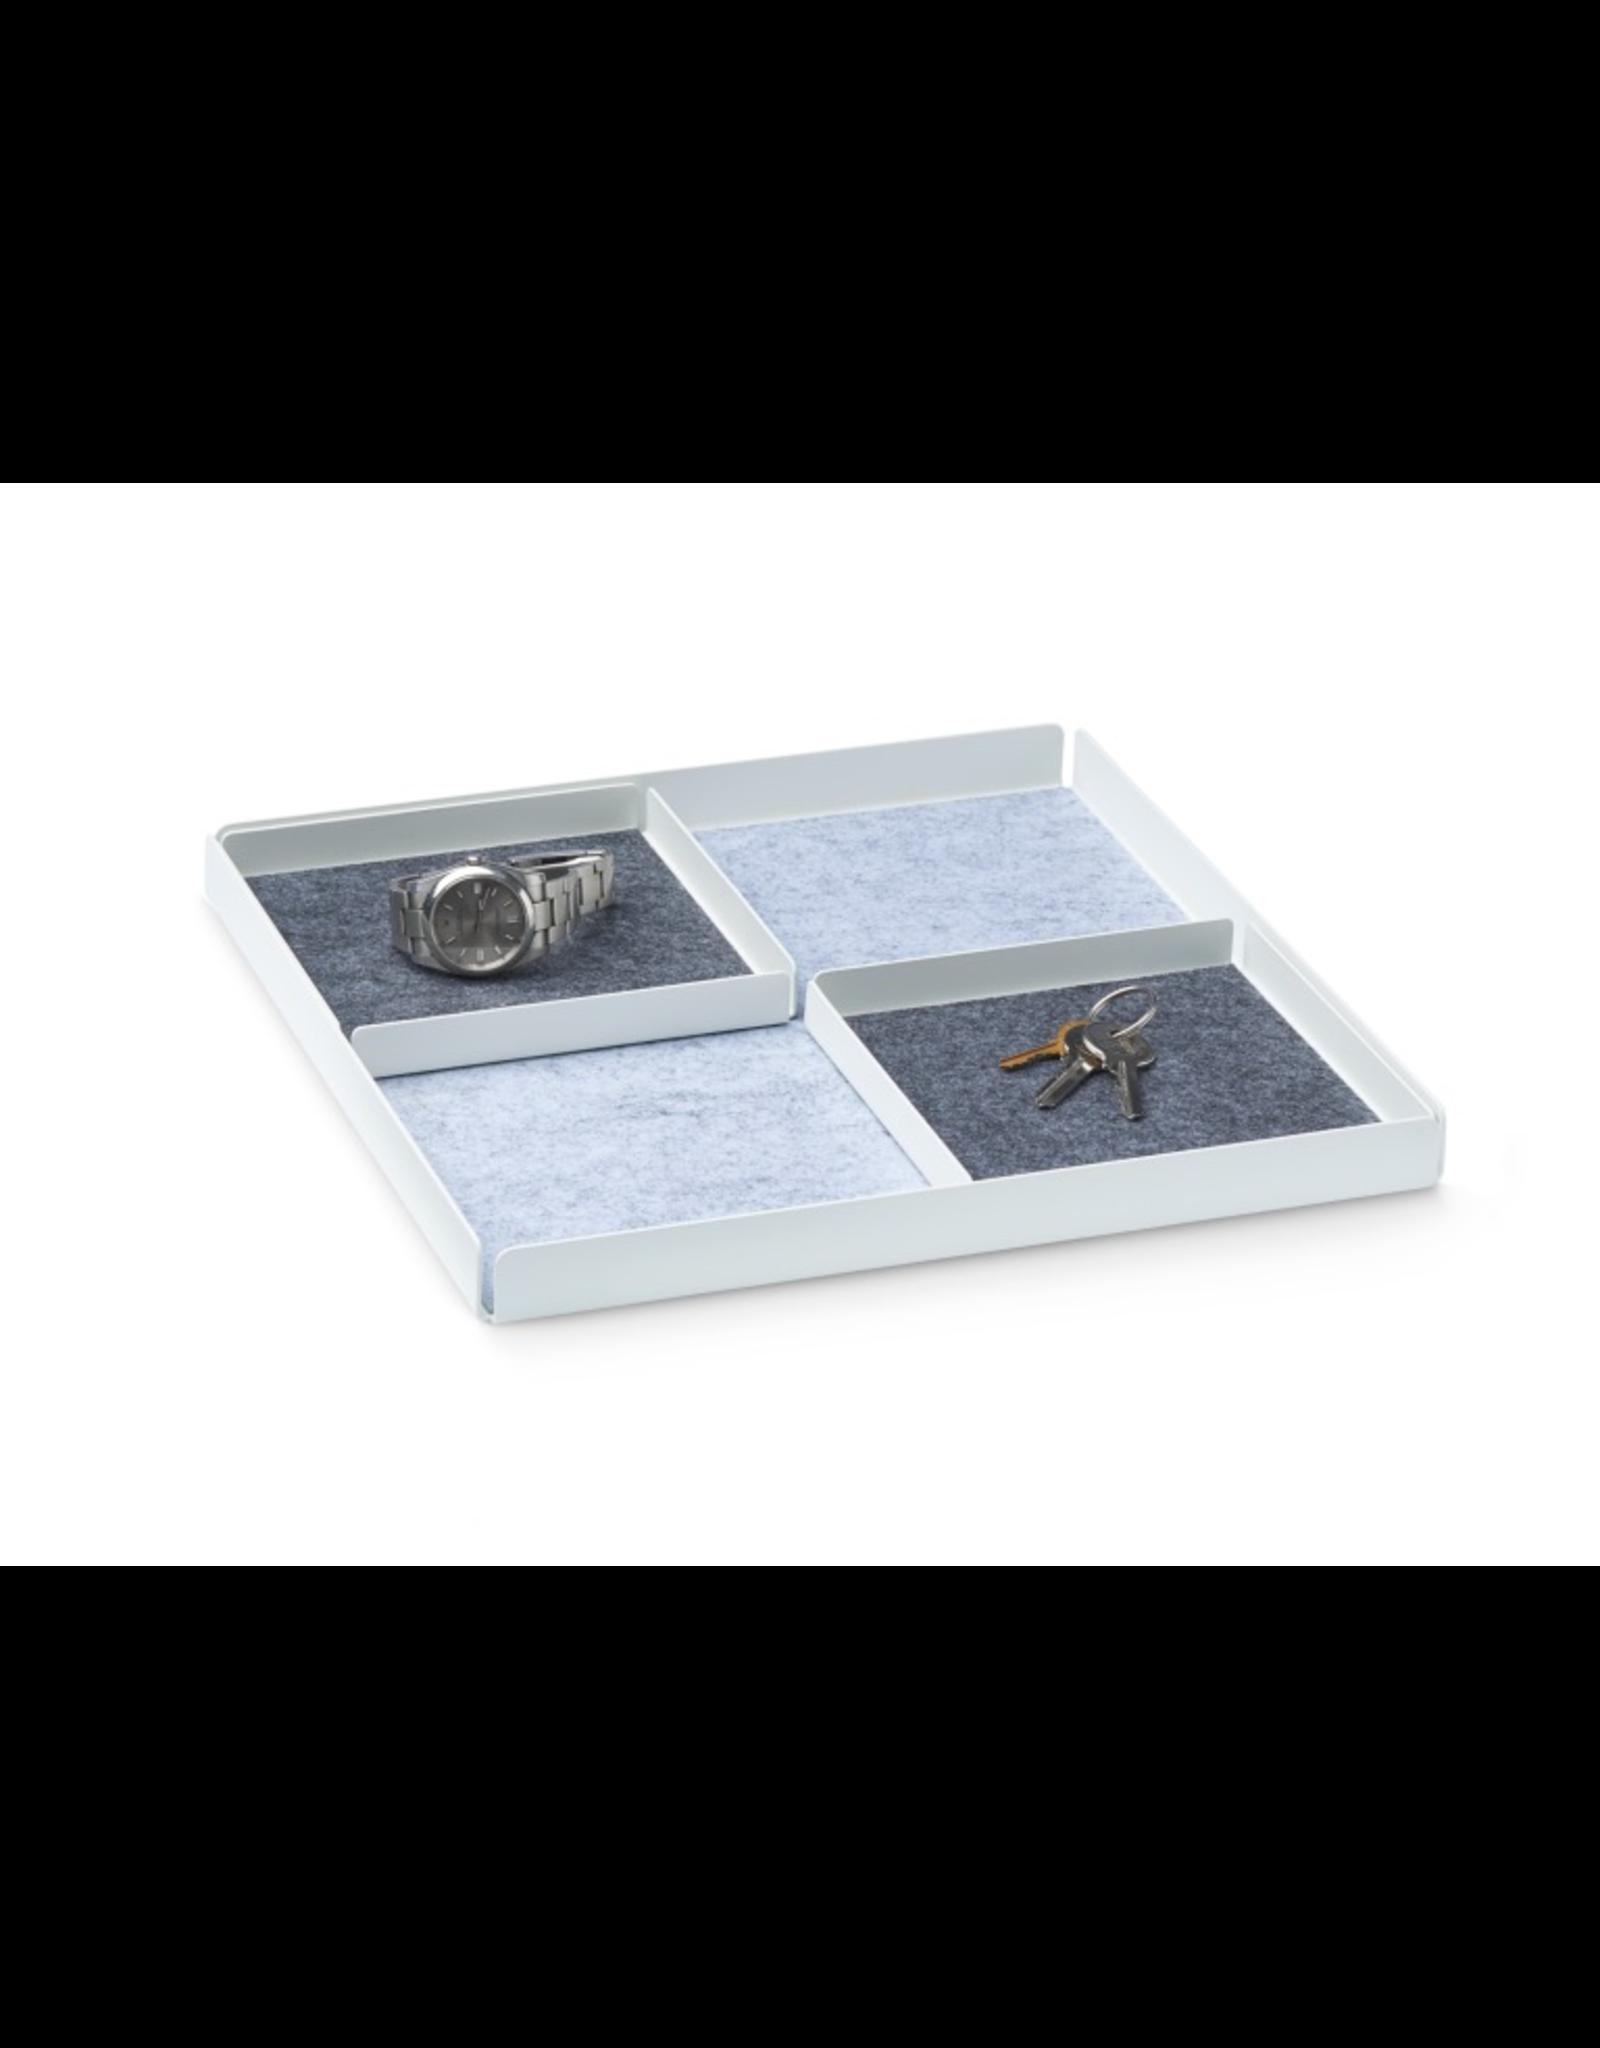 NAV Scandinavia POCKET REST X Organiser Tray Set 3pcs set. - White/Grey